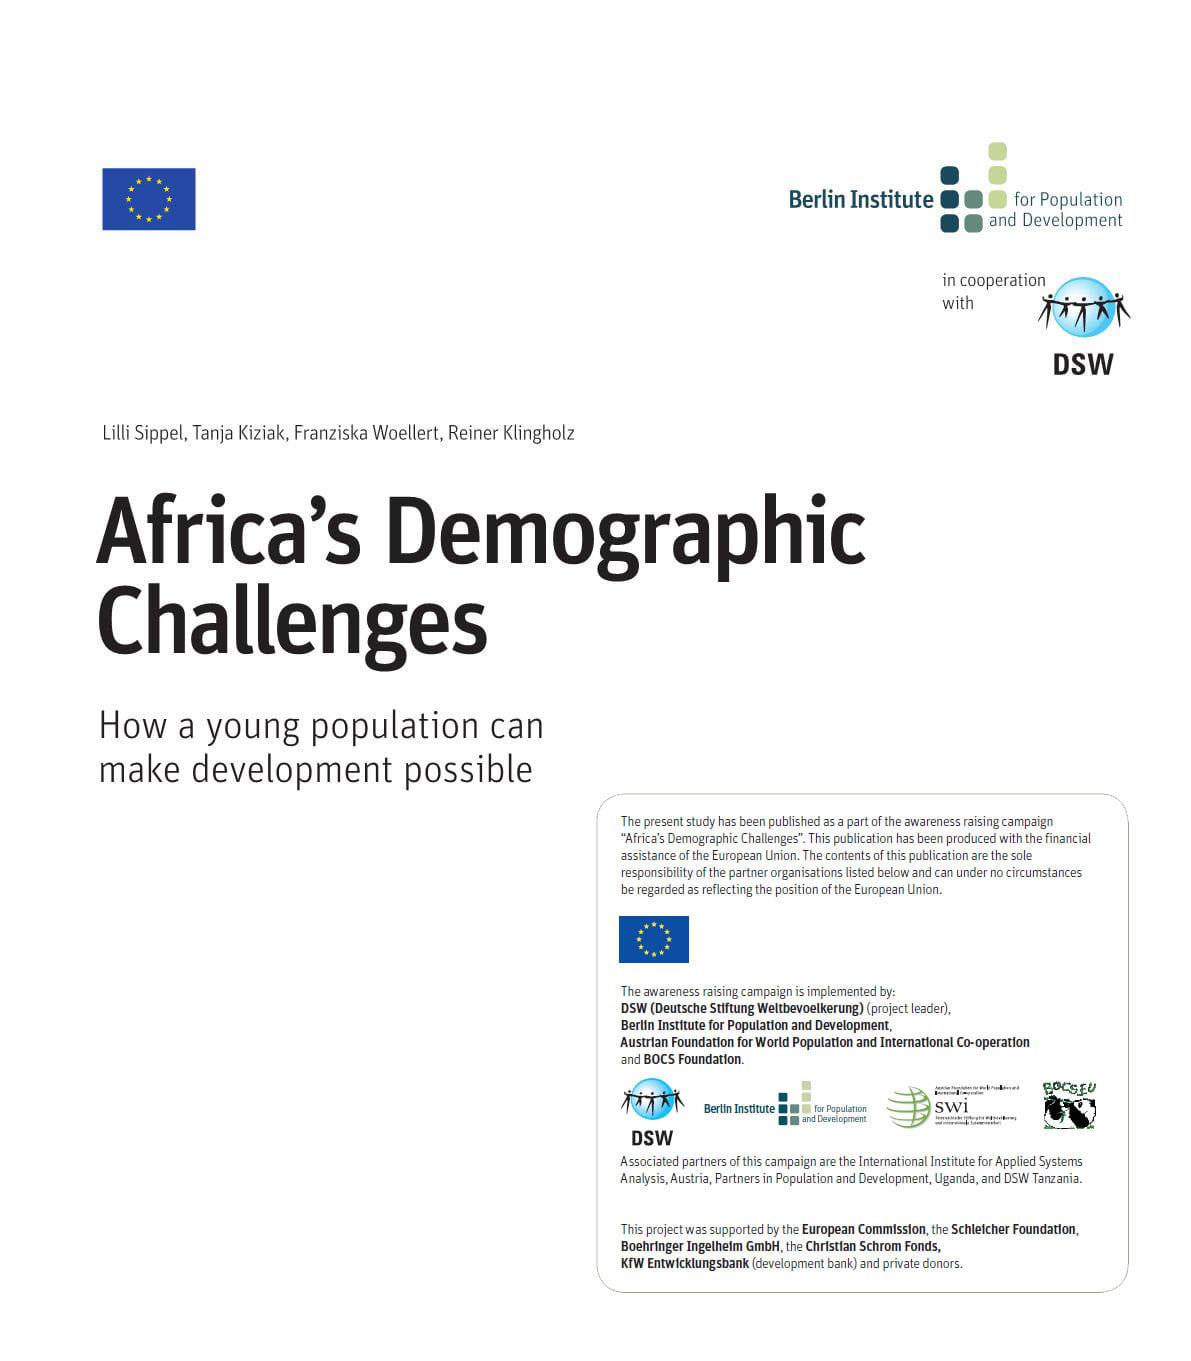 Africa's Demographic Challenges | BOCS foundation